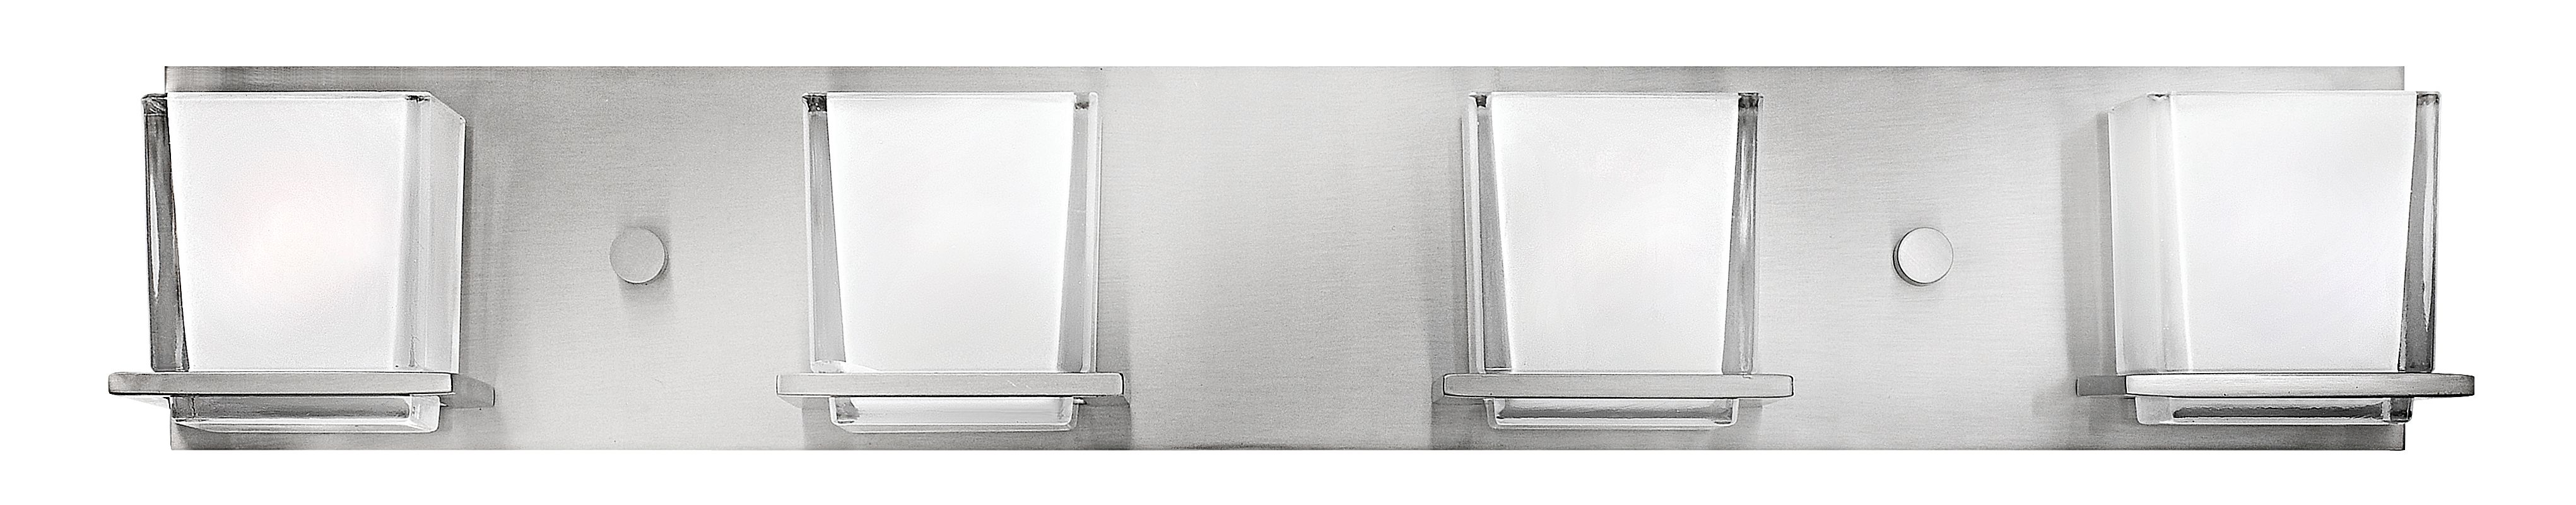 Hinkley 5774BN Brushed Nickel Contemporary Lola Bathroom Light